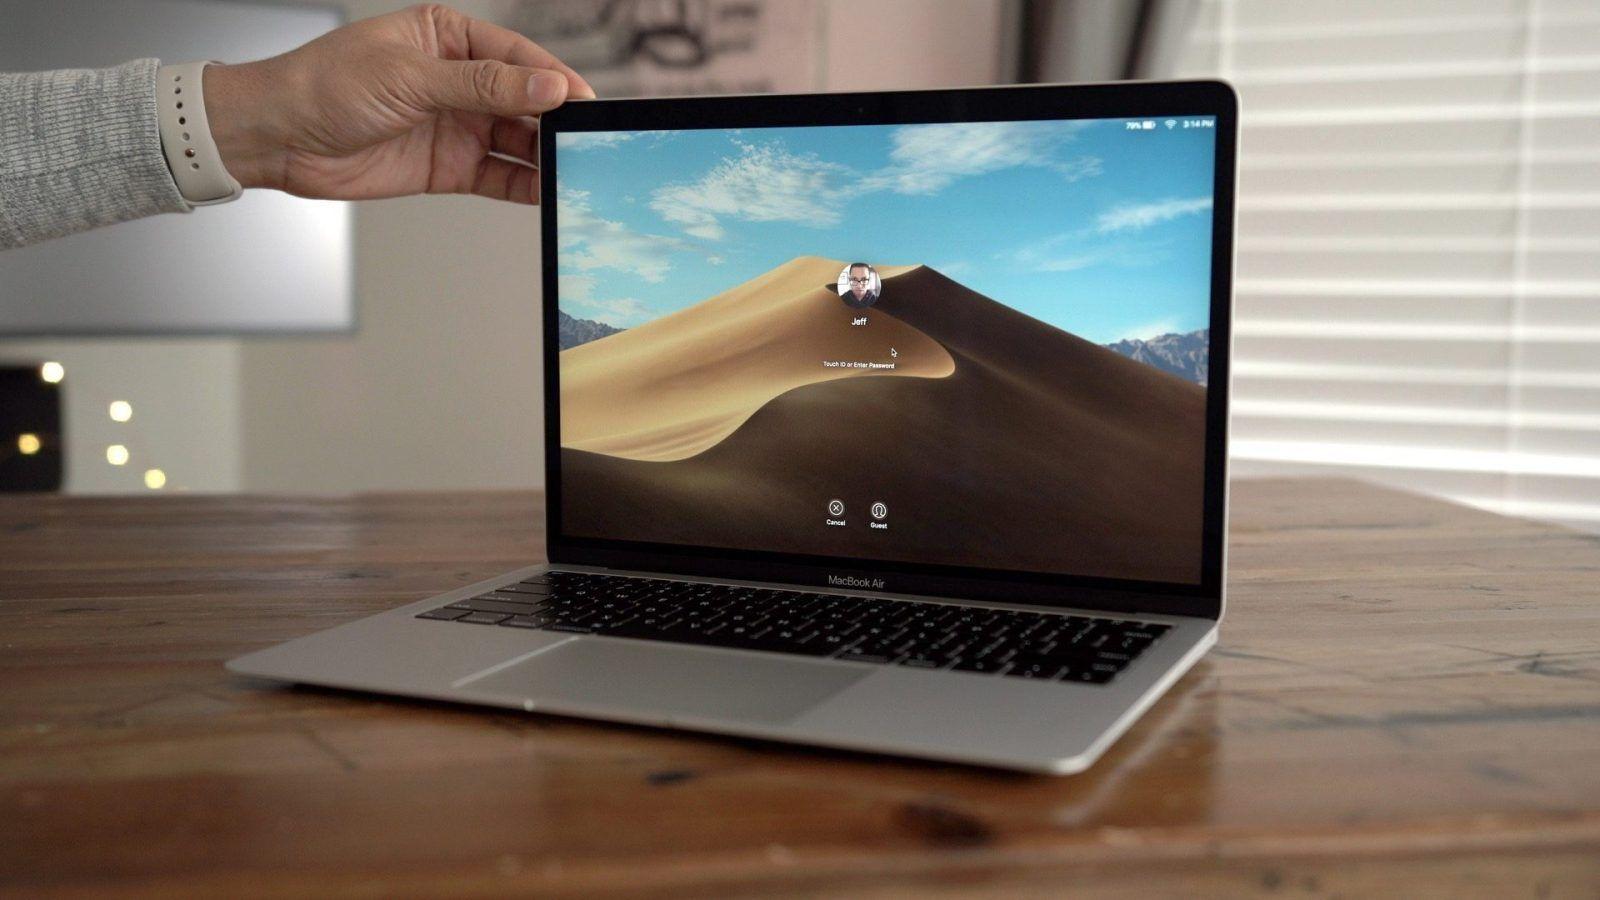 9to5Rewards Win Apple's new MacBook Air from Setapp